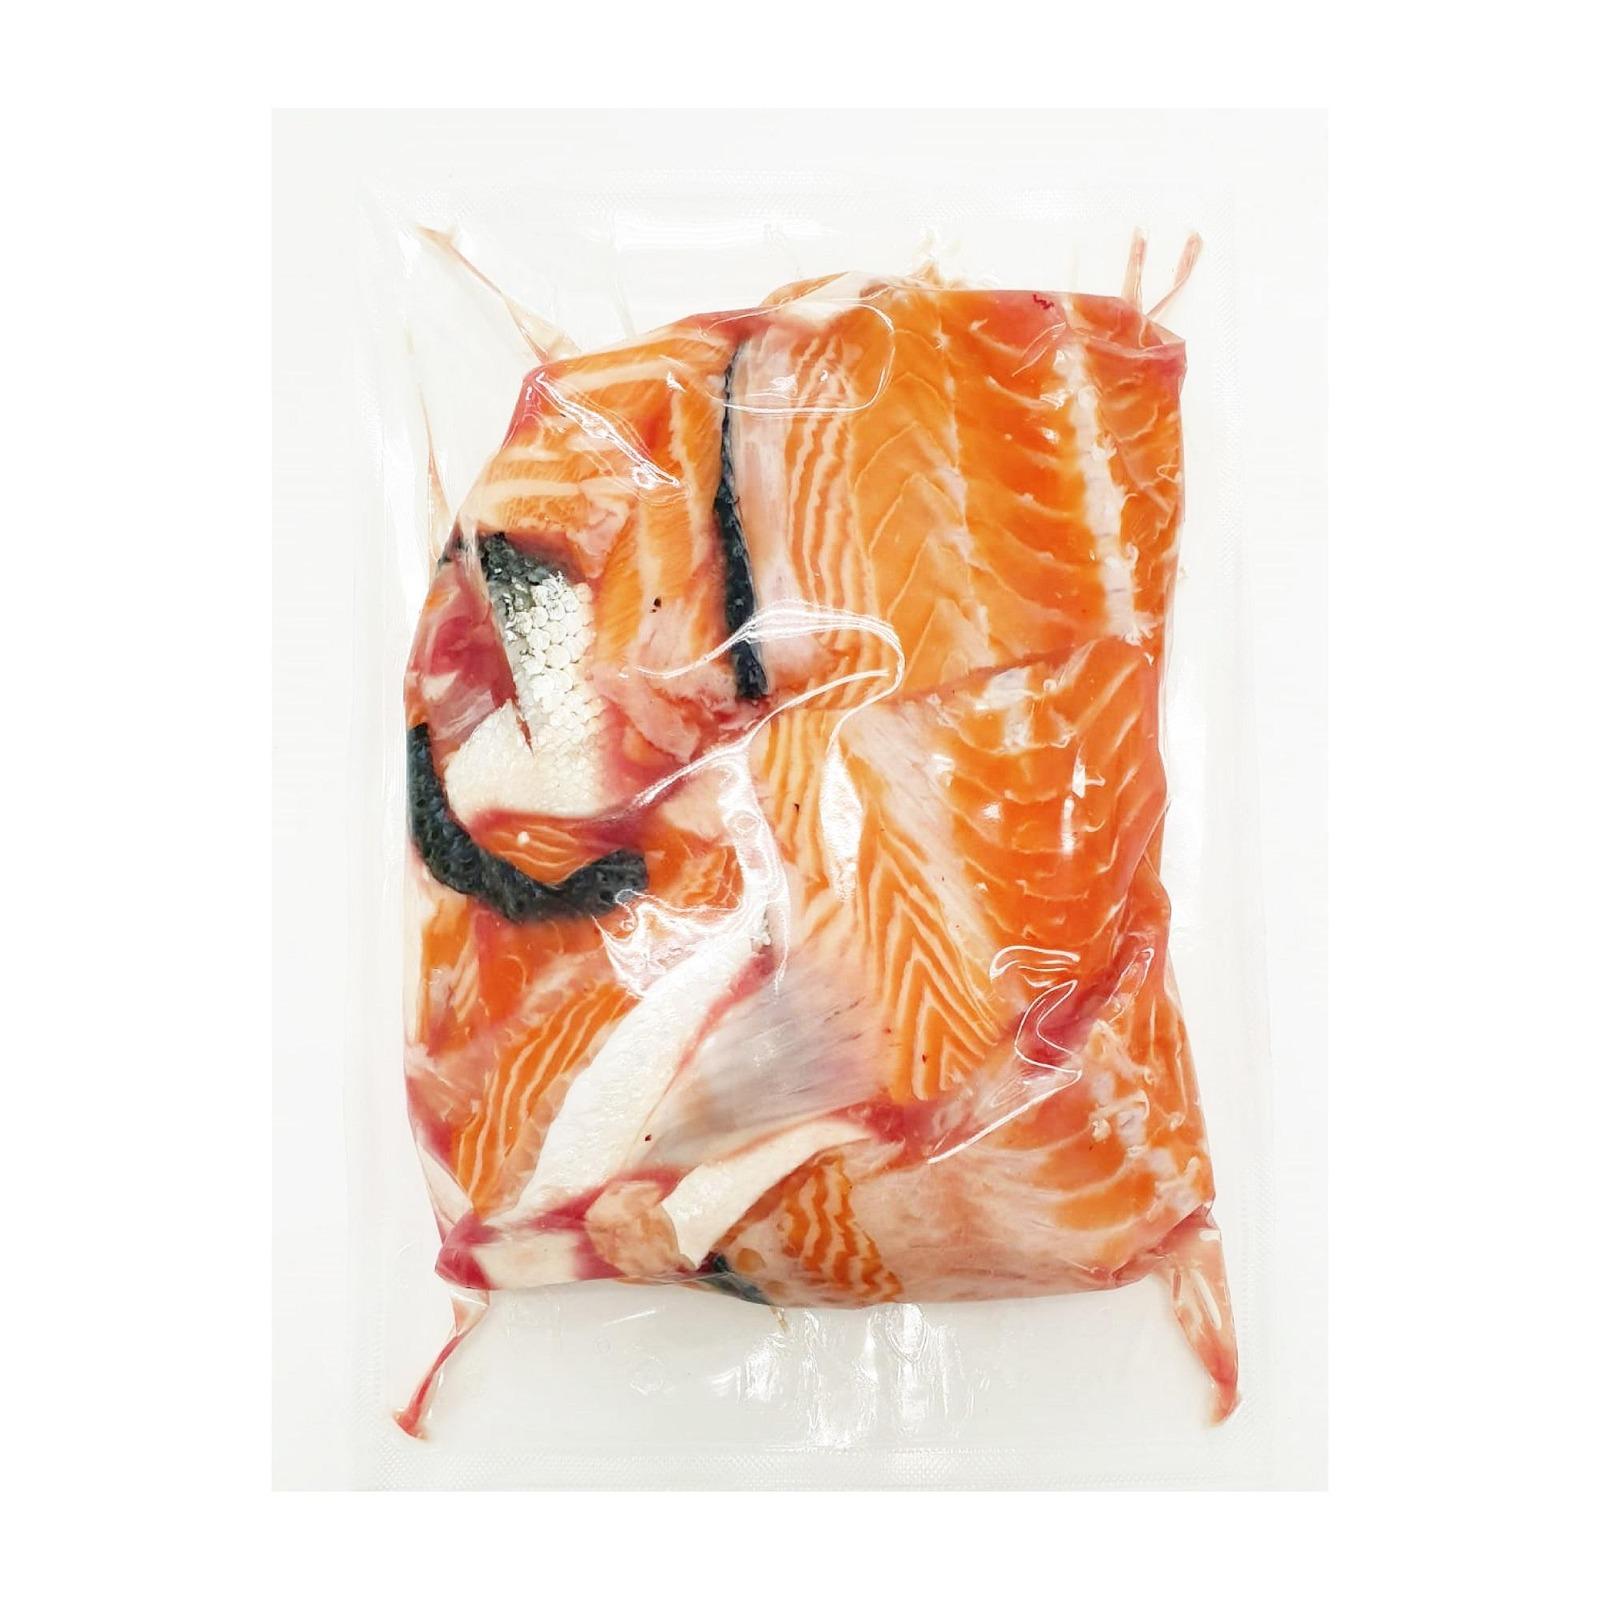 Royal Delight Salmon Fish Bones